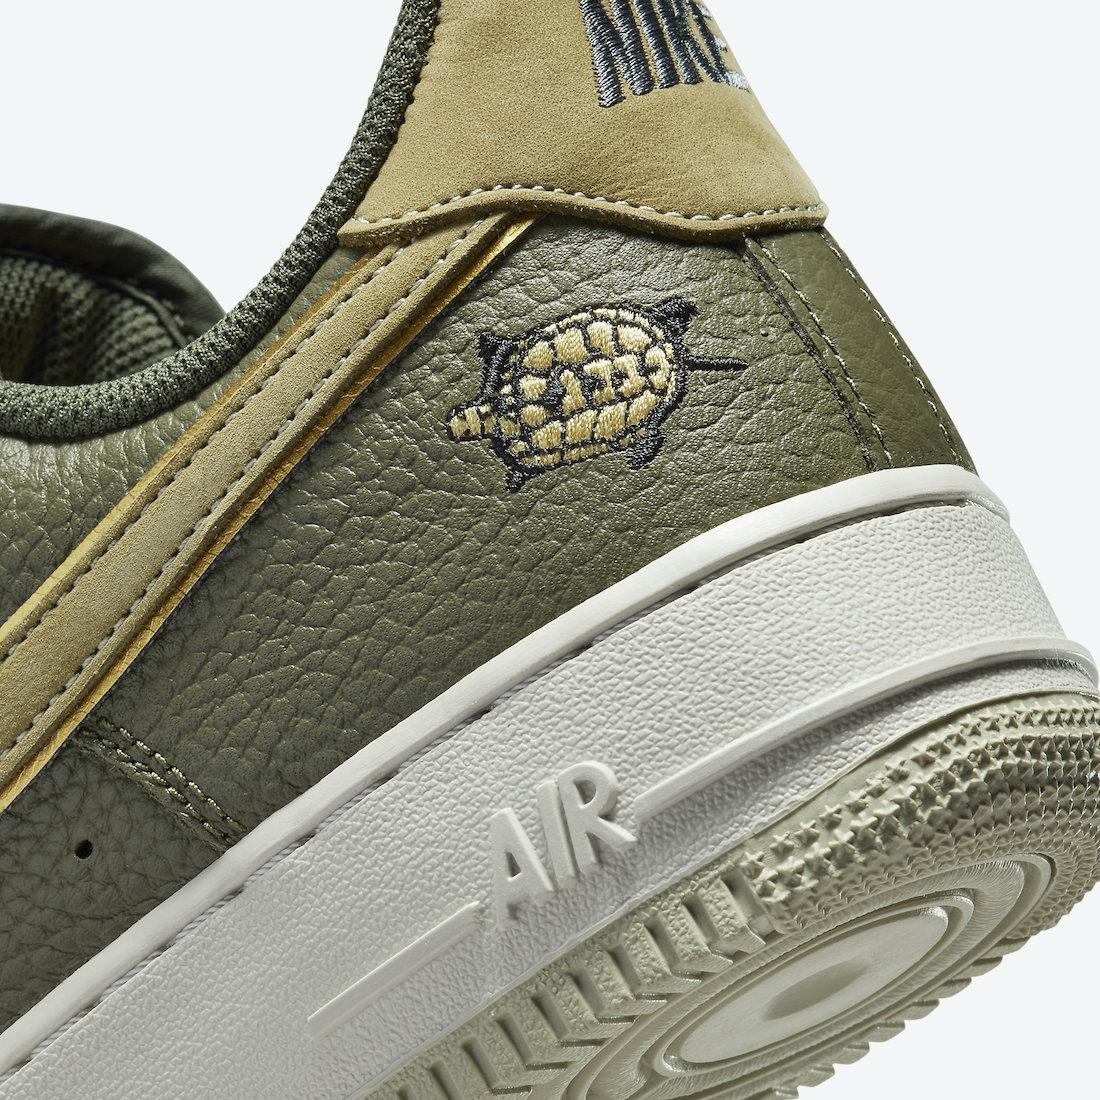 Nike Air Force 1 Low 'Turtle' DA8482-200 5